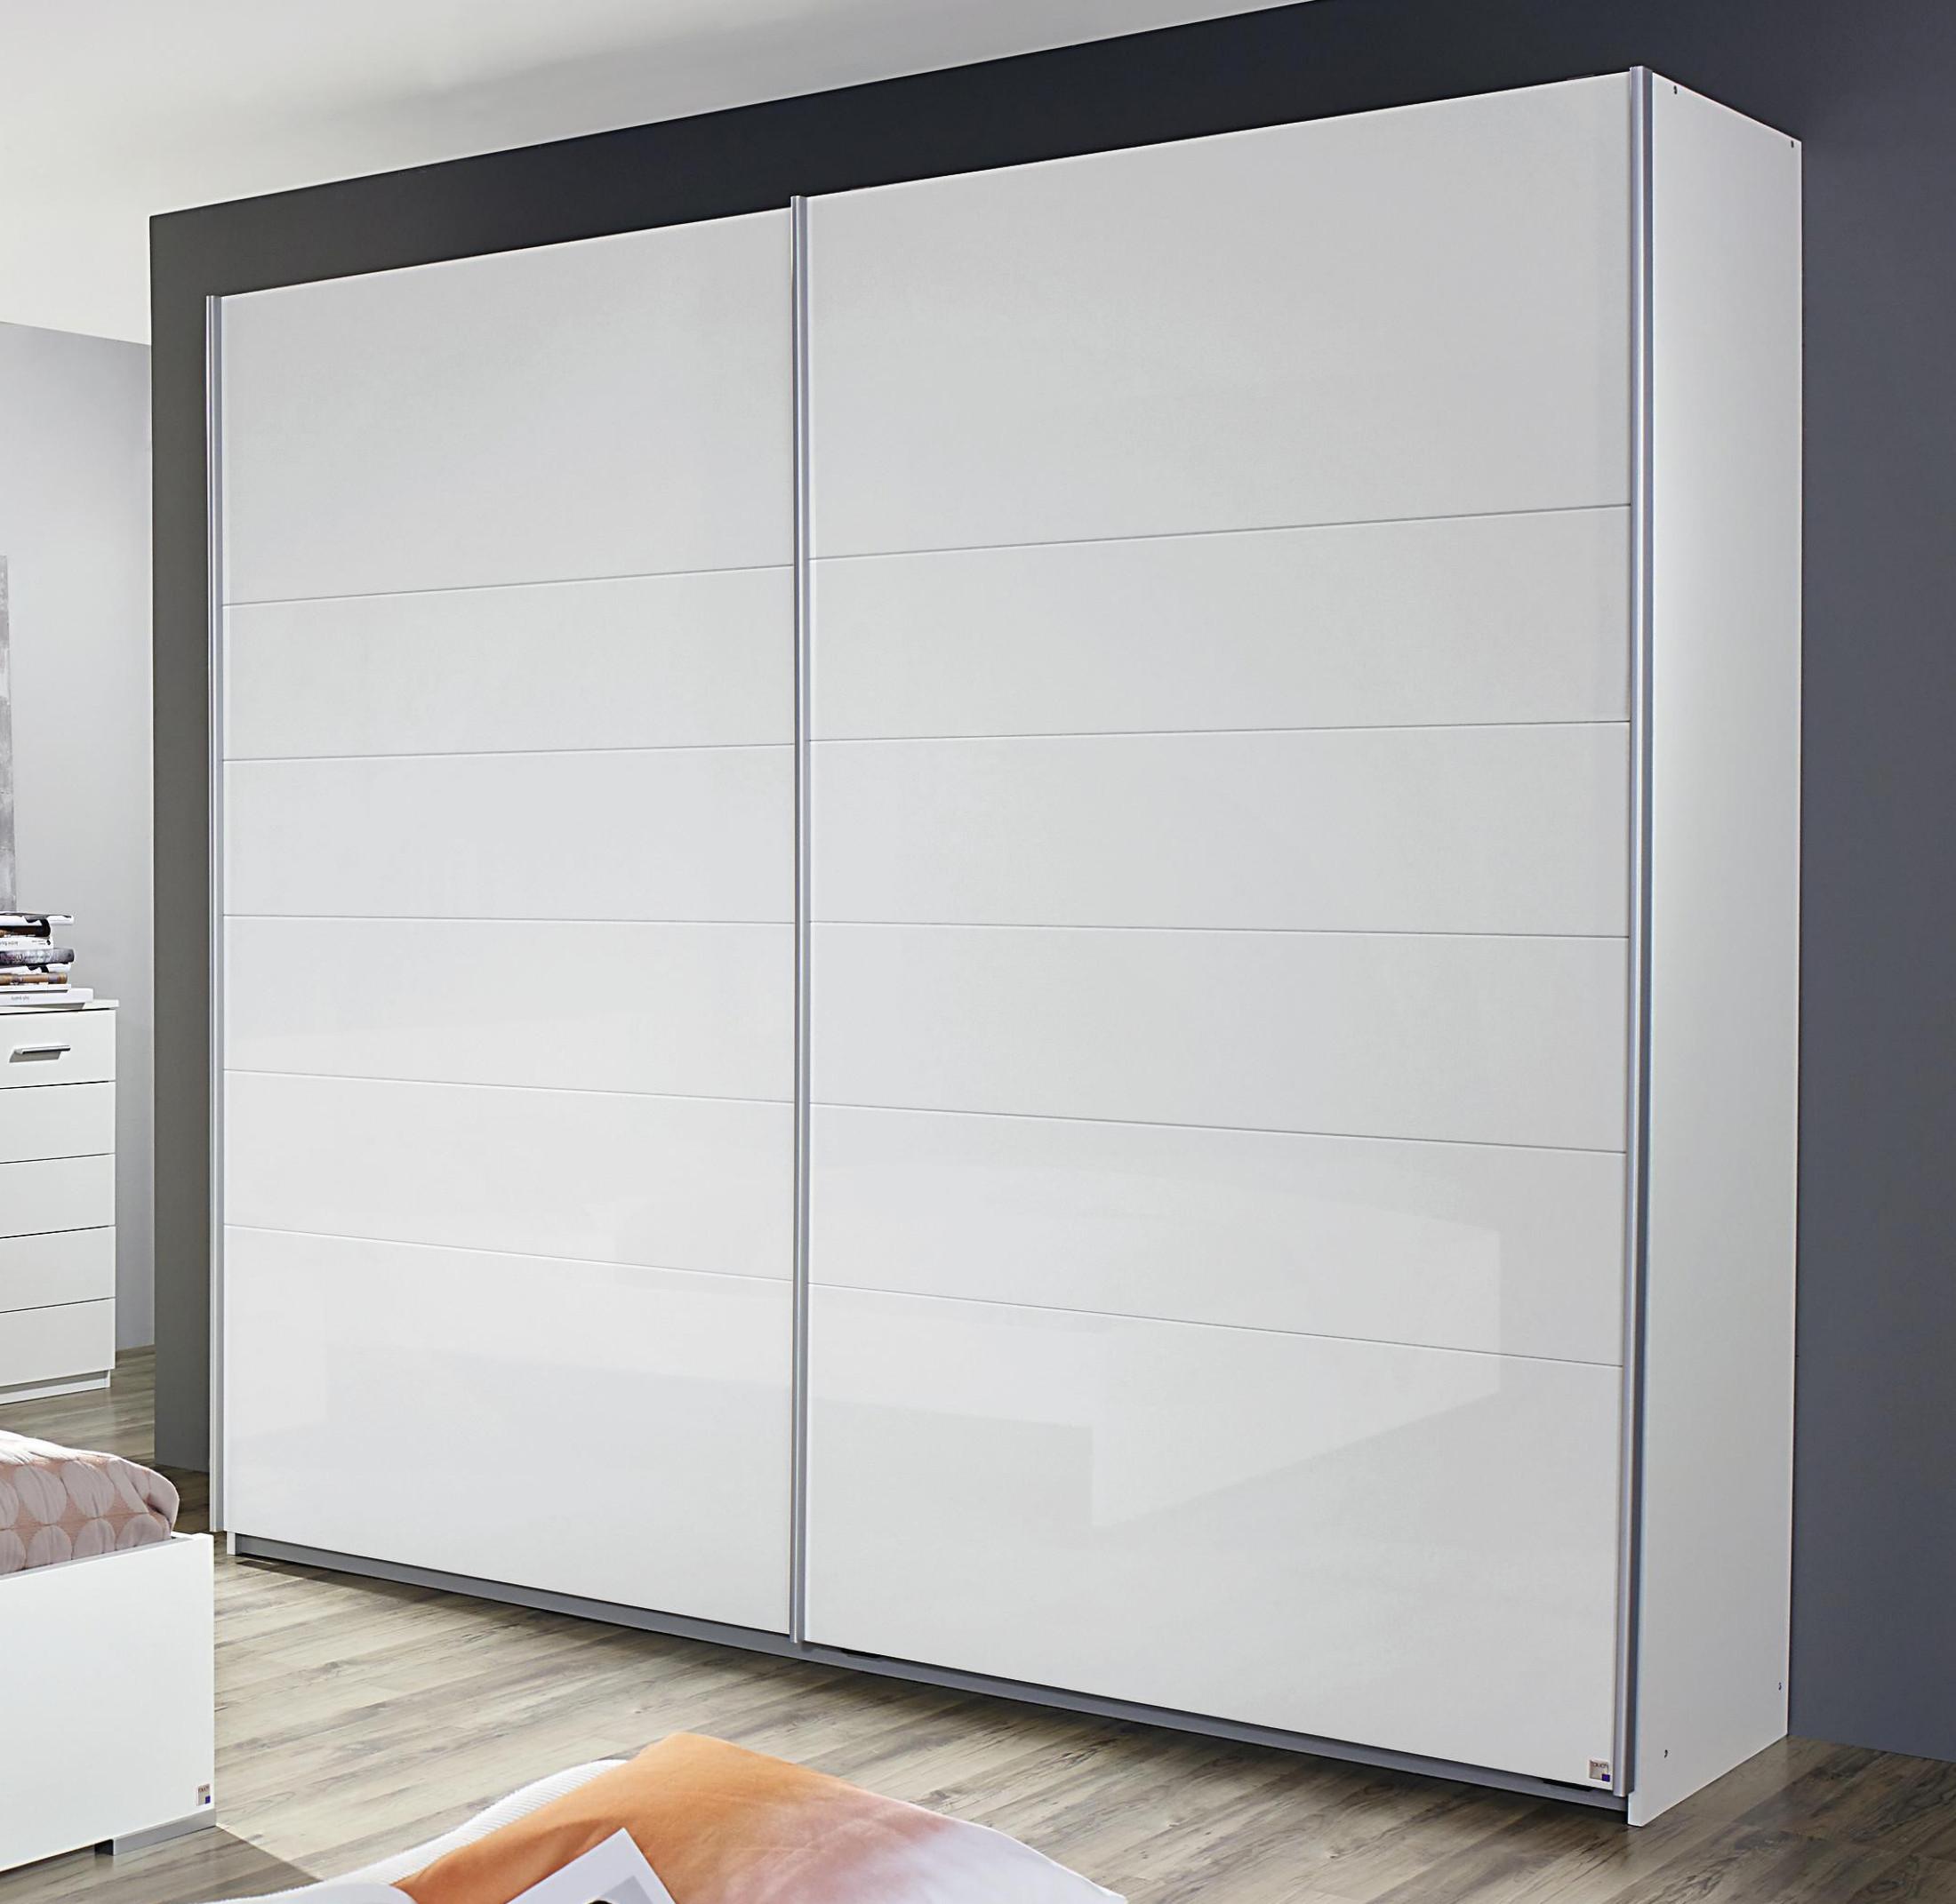 schwebet renschrank weiss hochglanz woody 33 01179 modern m bel24. Black Bedroom Furniture Sets. Home Design Ideas